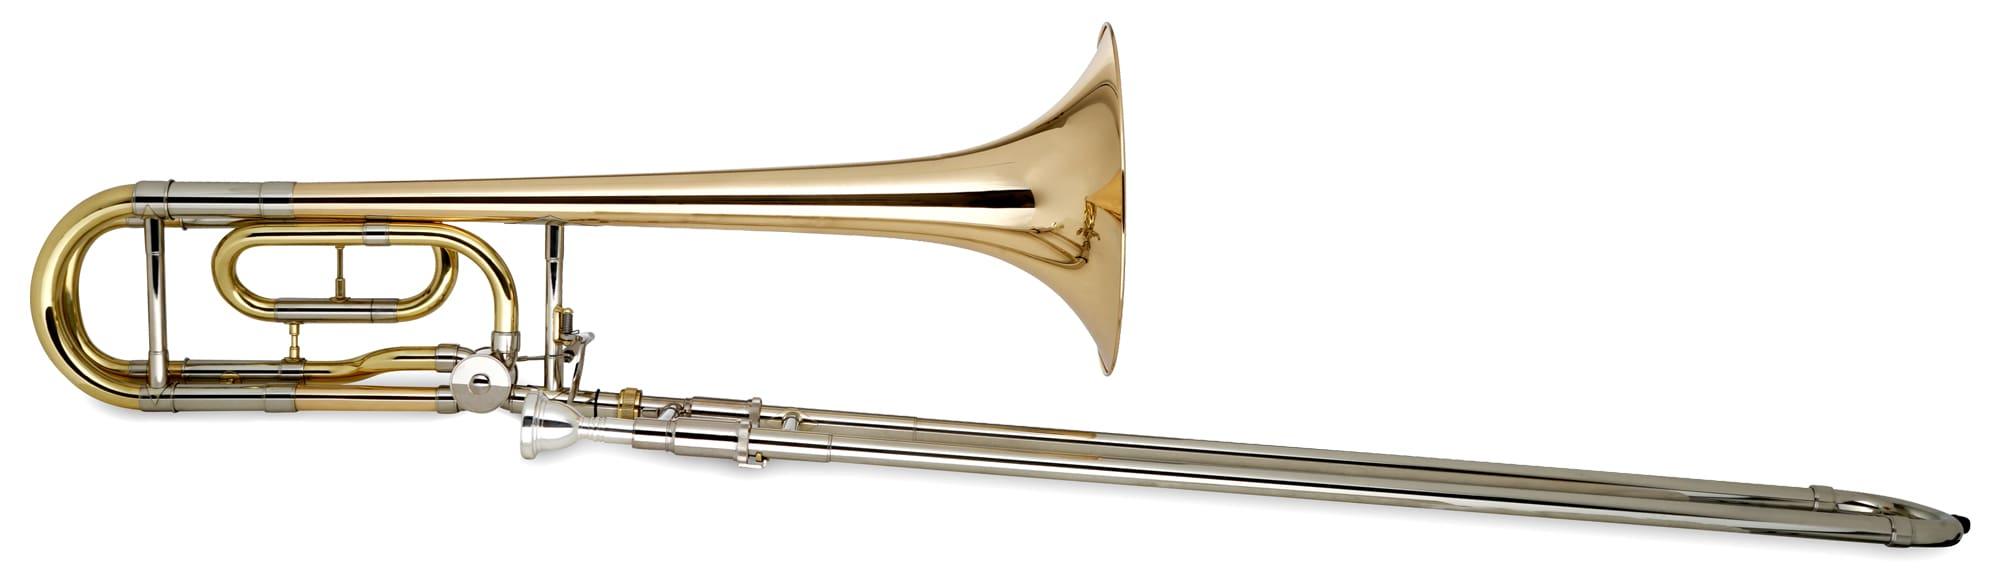 Posaunen - Classic Cantabile Brass QP 42 Quartposaune - Onlineshop Musikhaus Kirstein